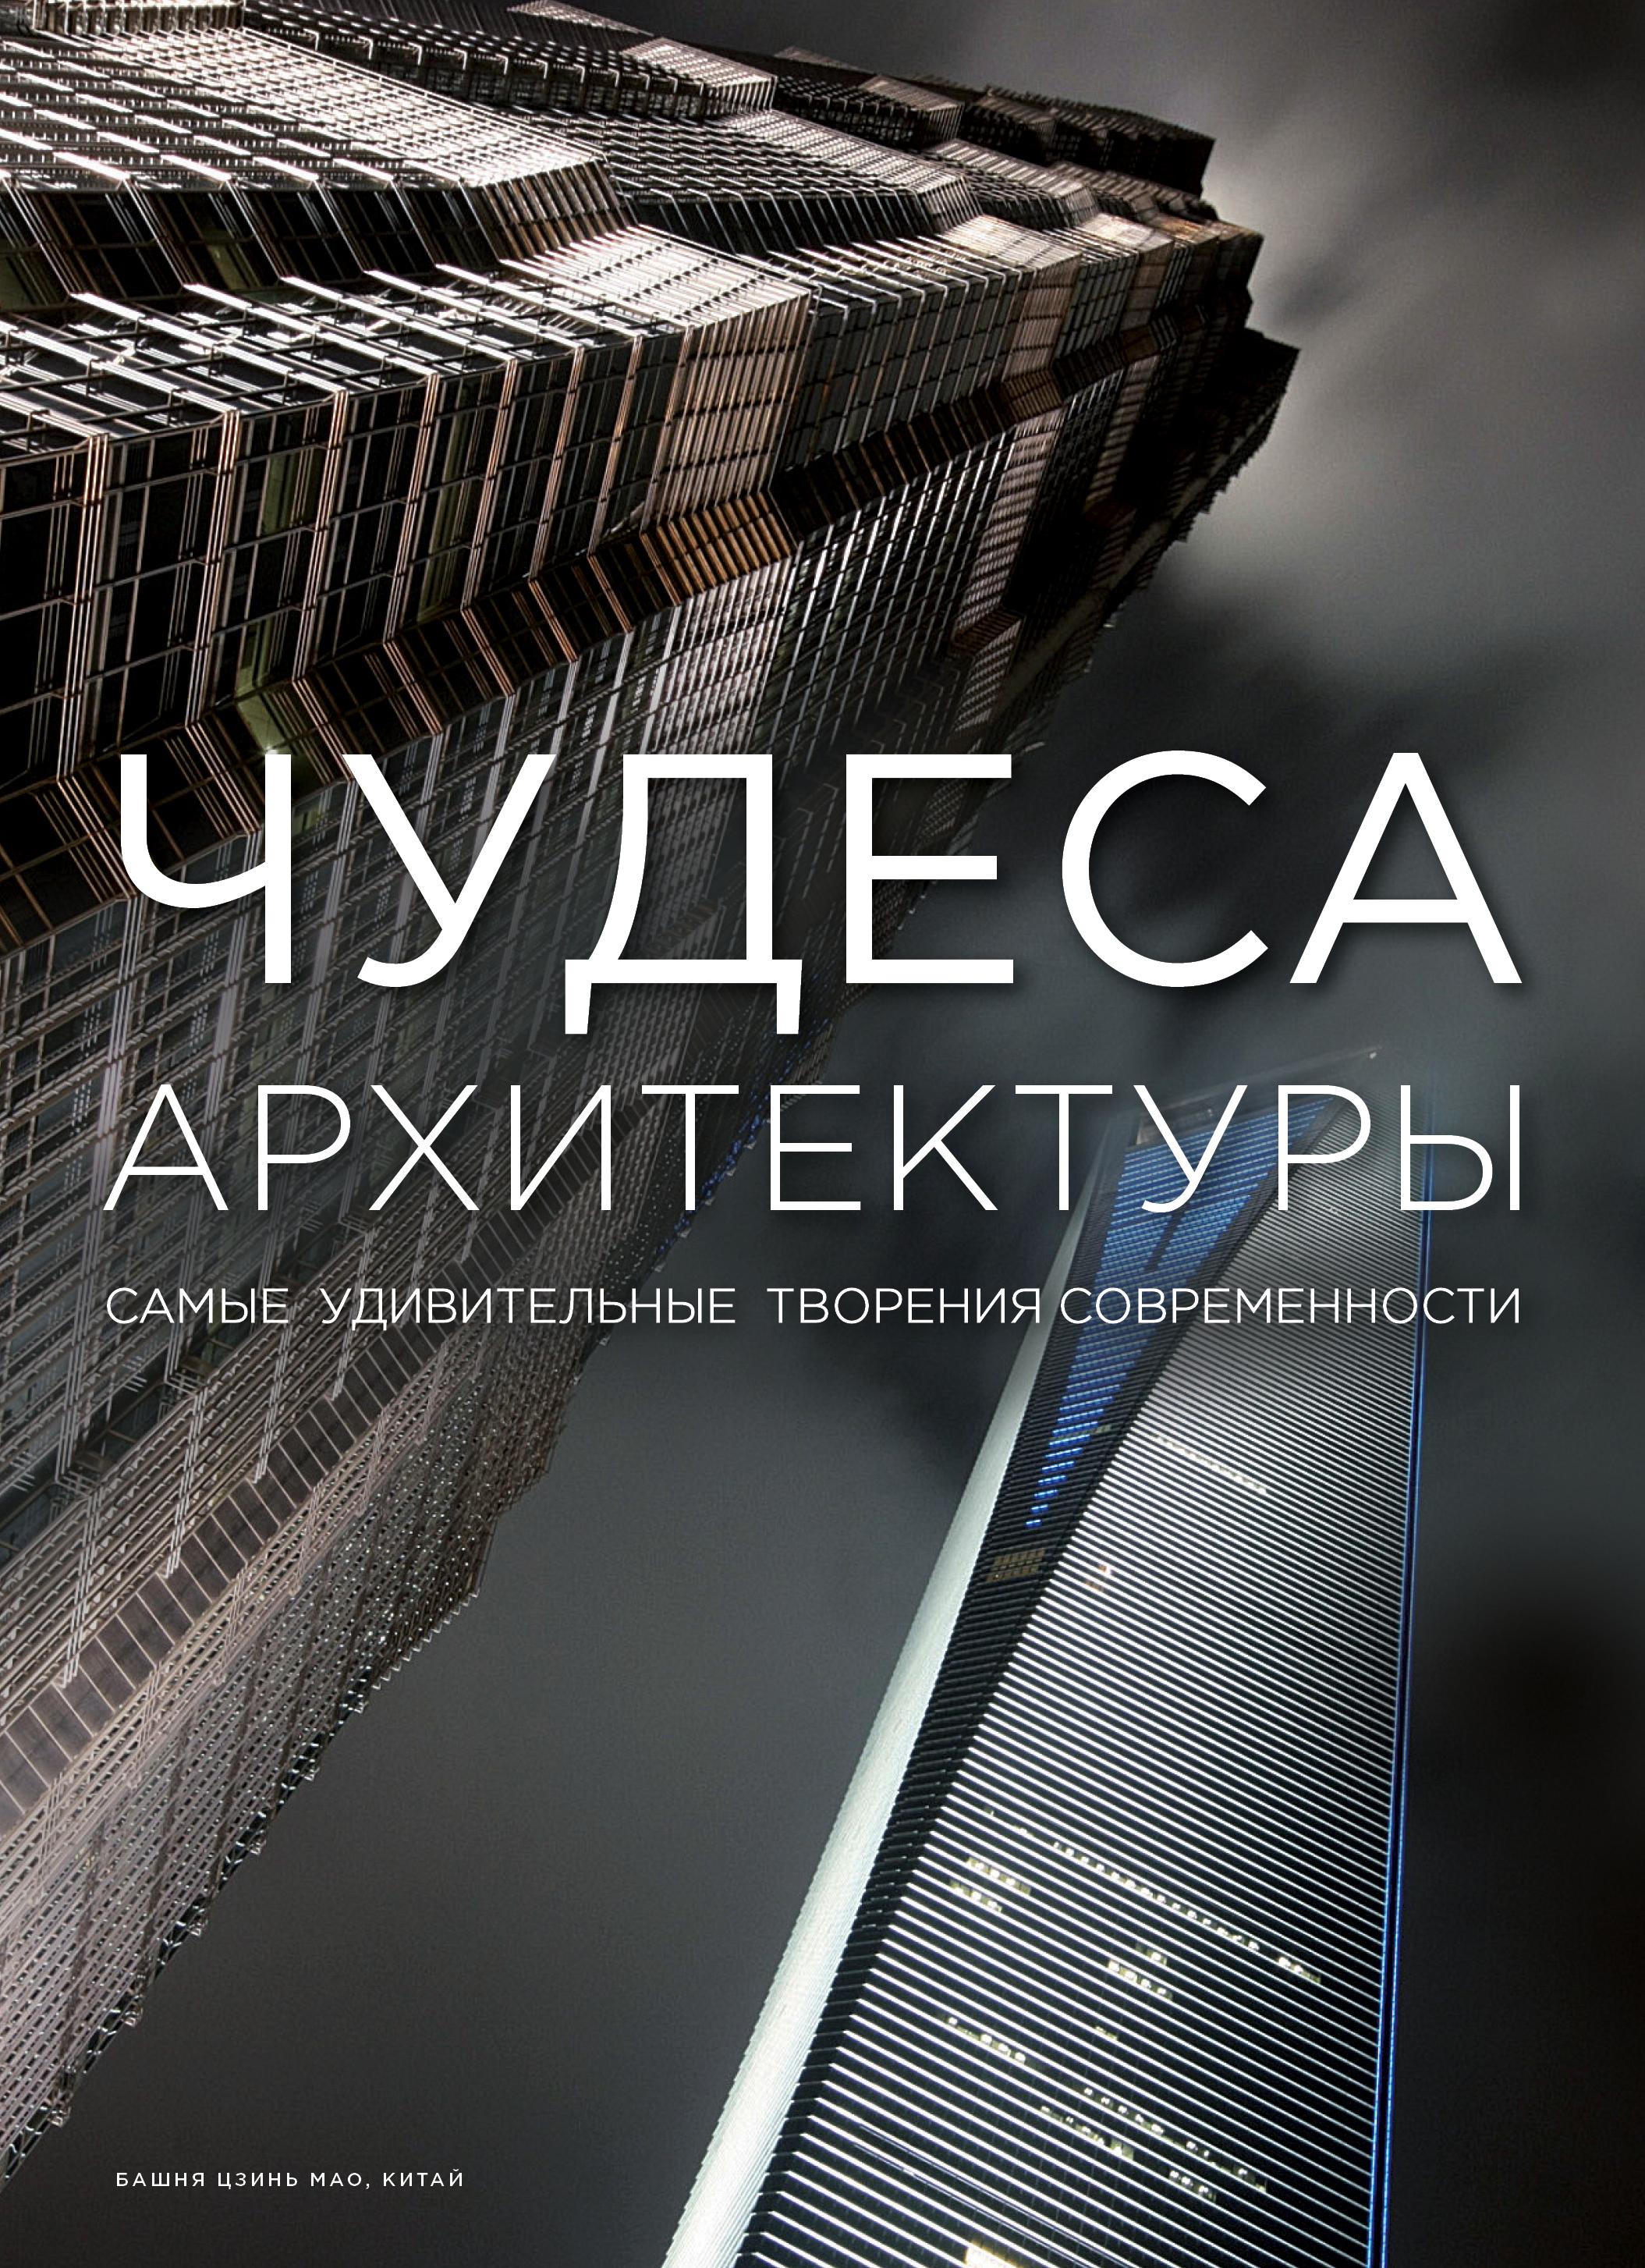 Чудеса архитектуры ISBN: 978-5-699-76385-6